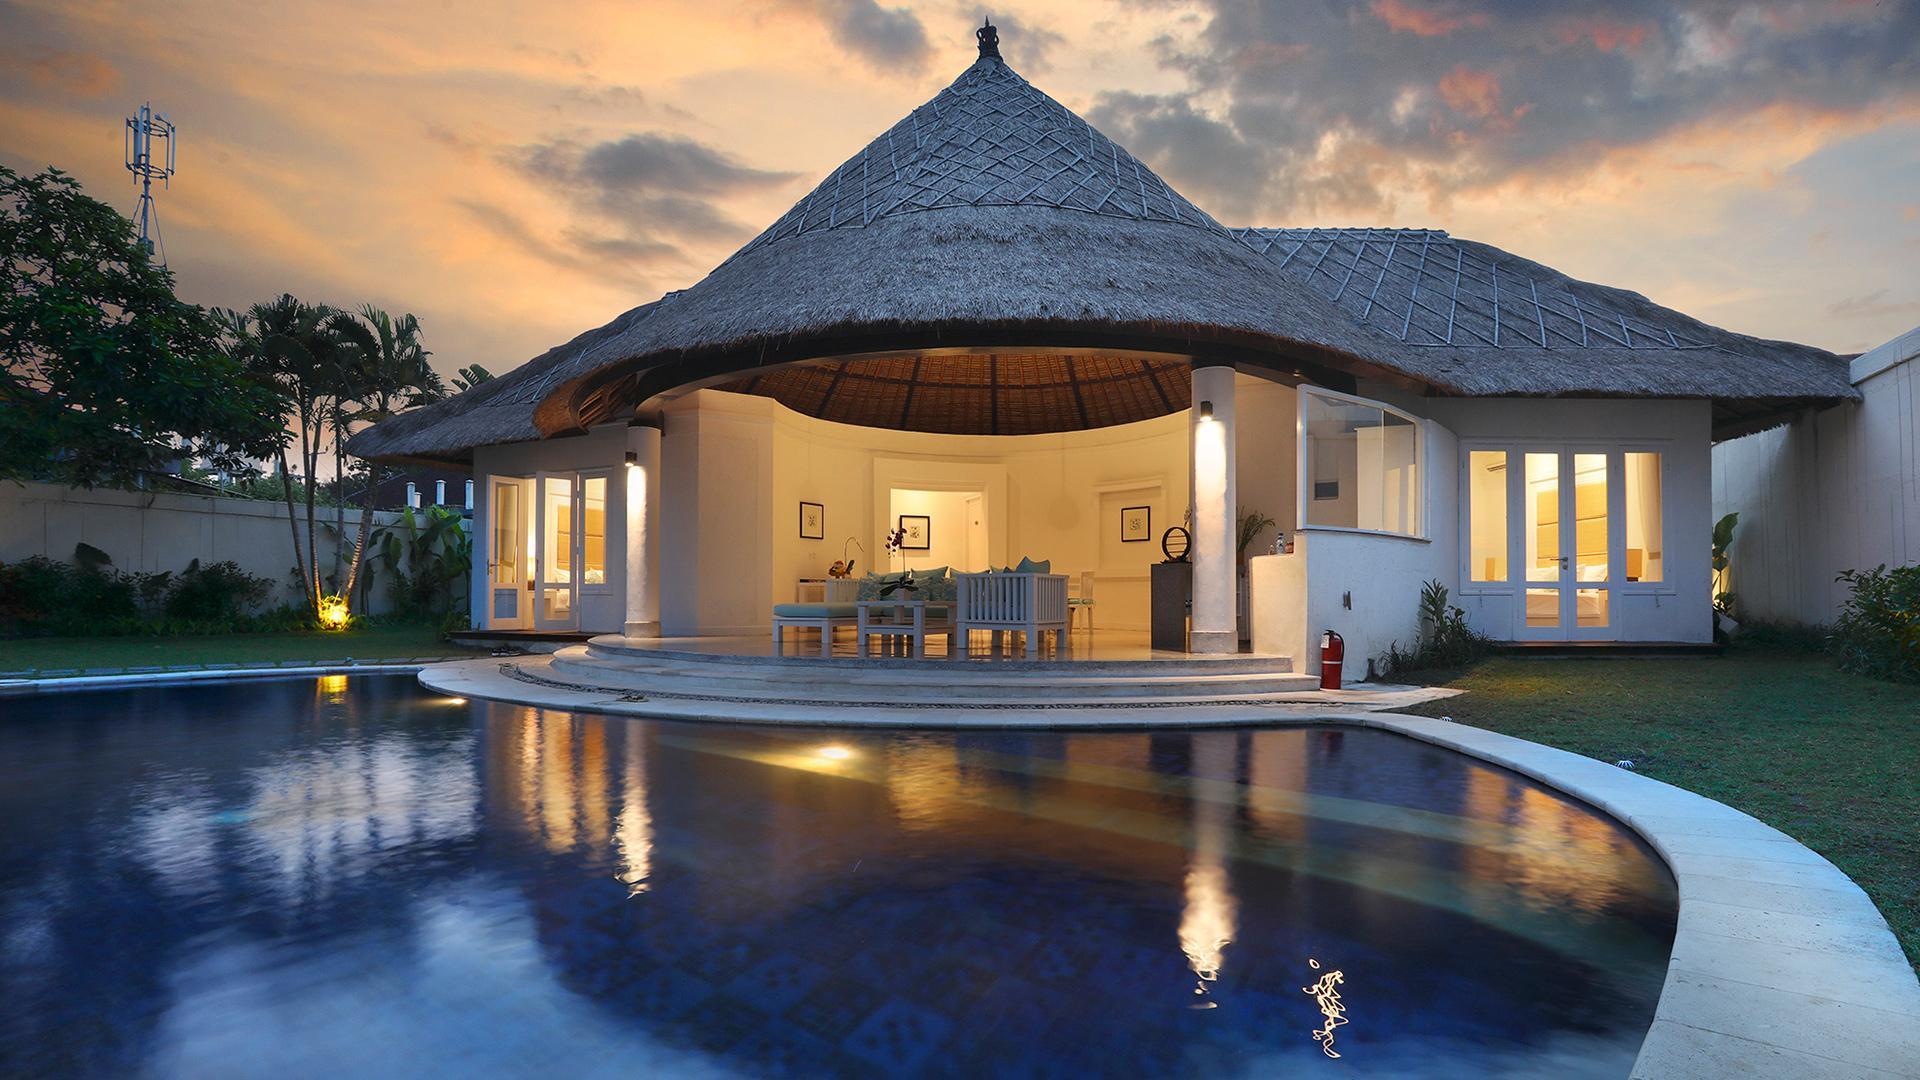 Two-Bedroom Pool Villa image 1 at Alam Boutique Resort by Kabupaten Badung, Bali, Indonesia